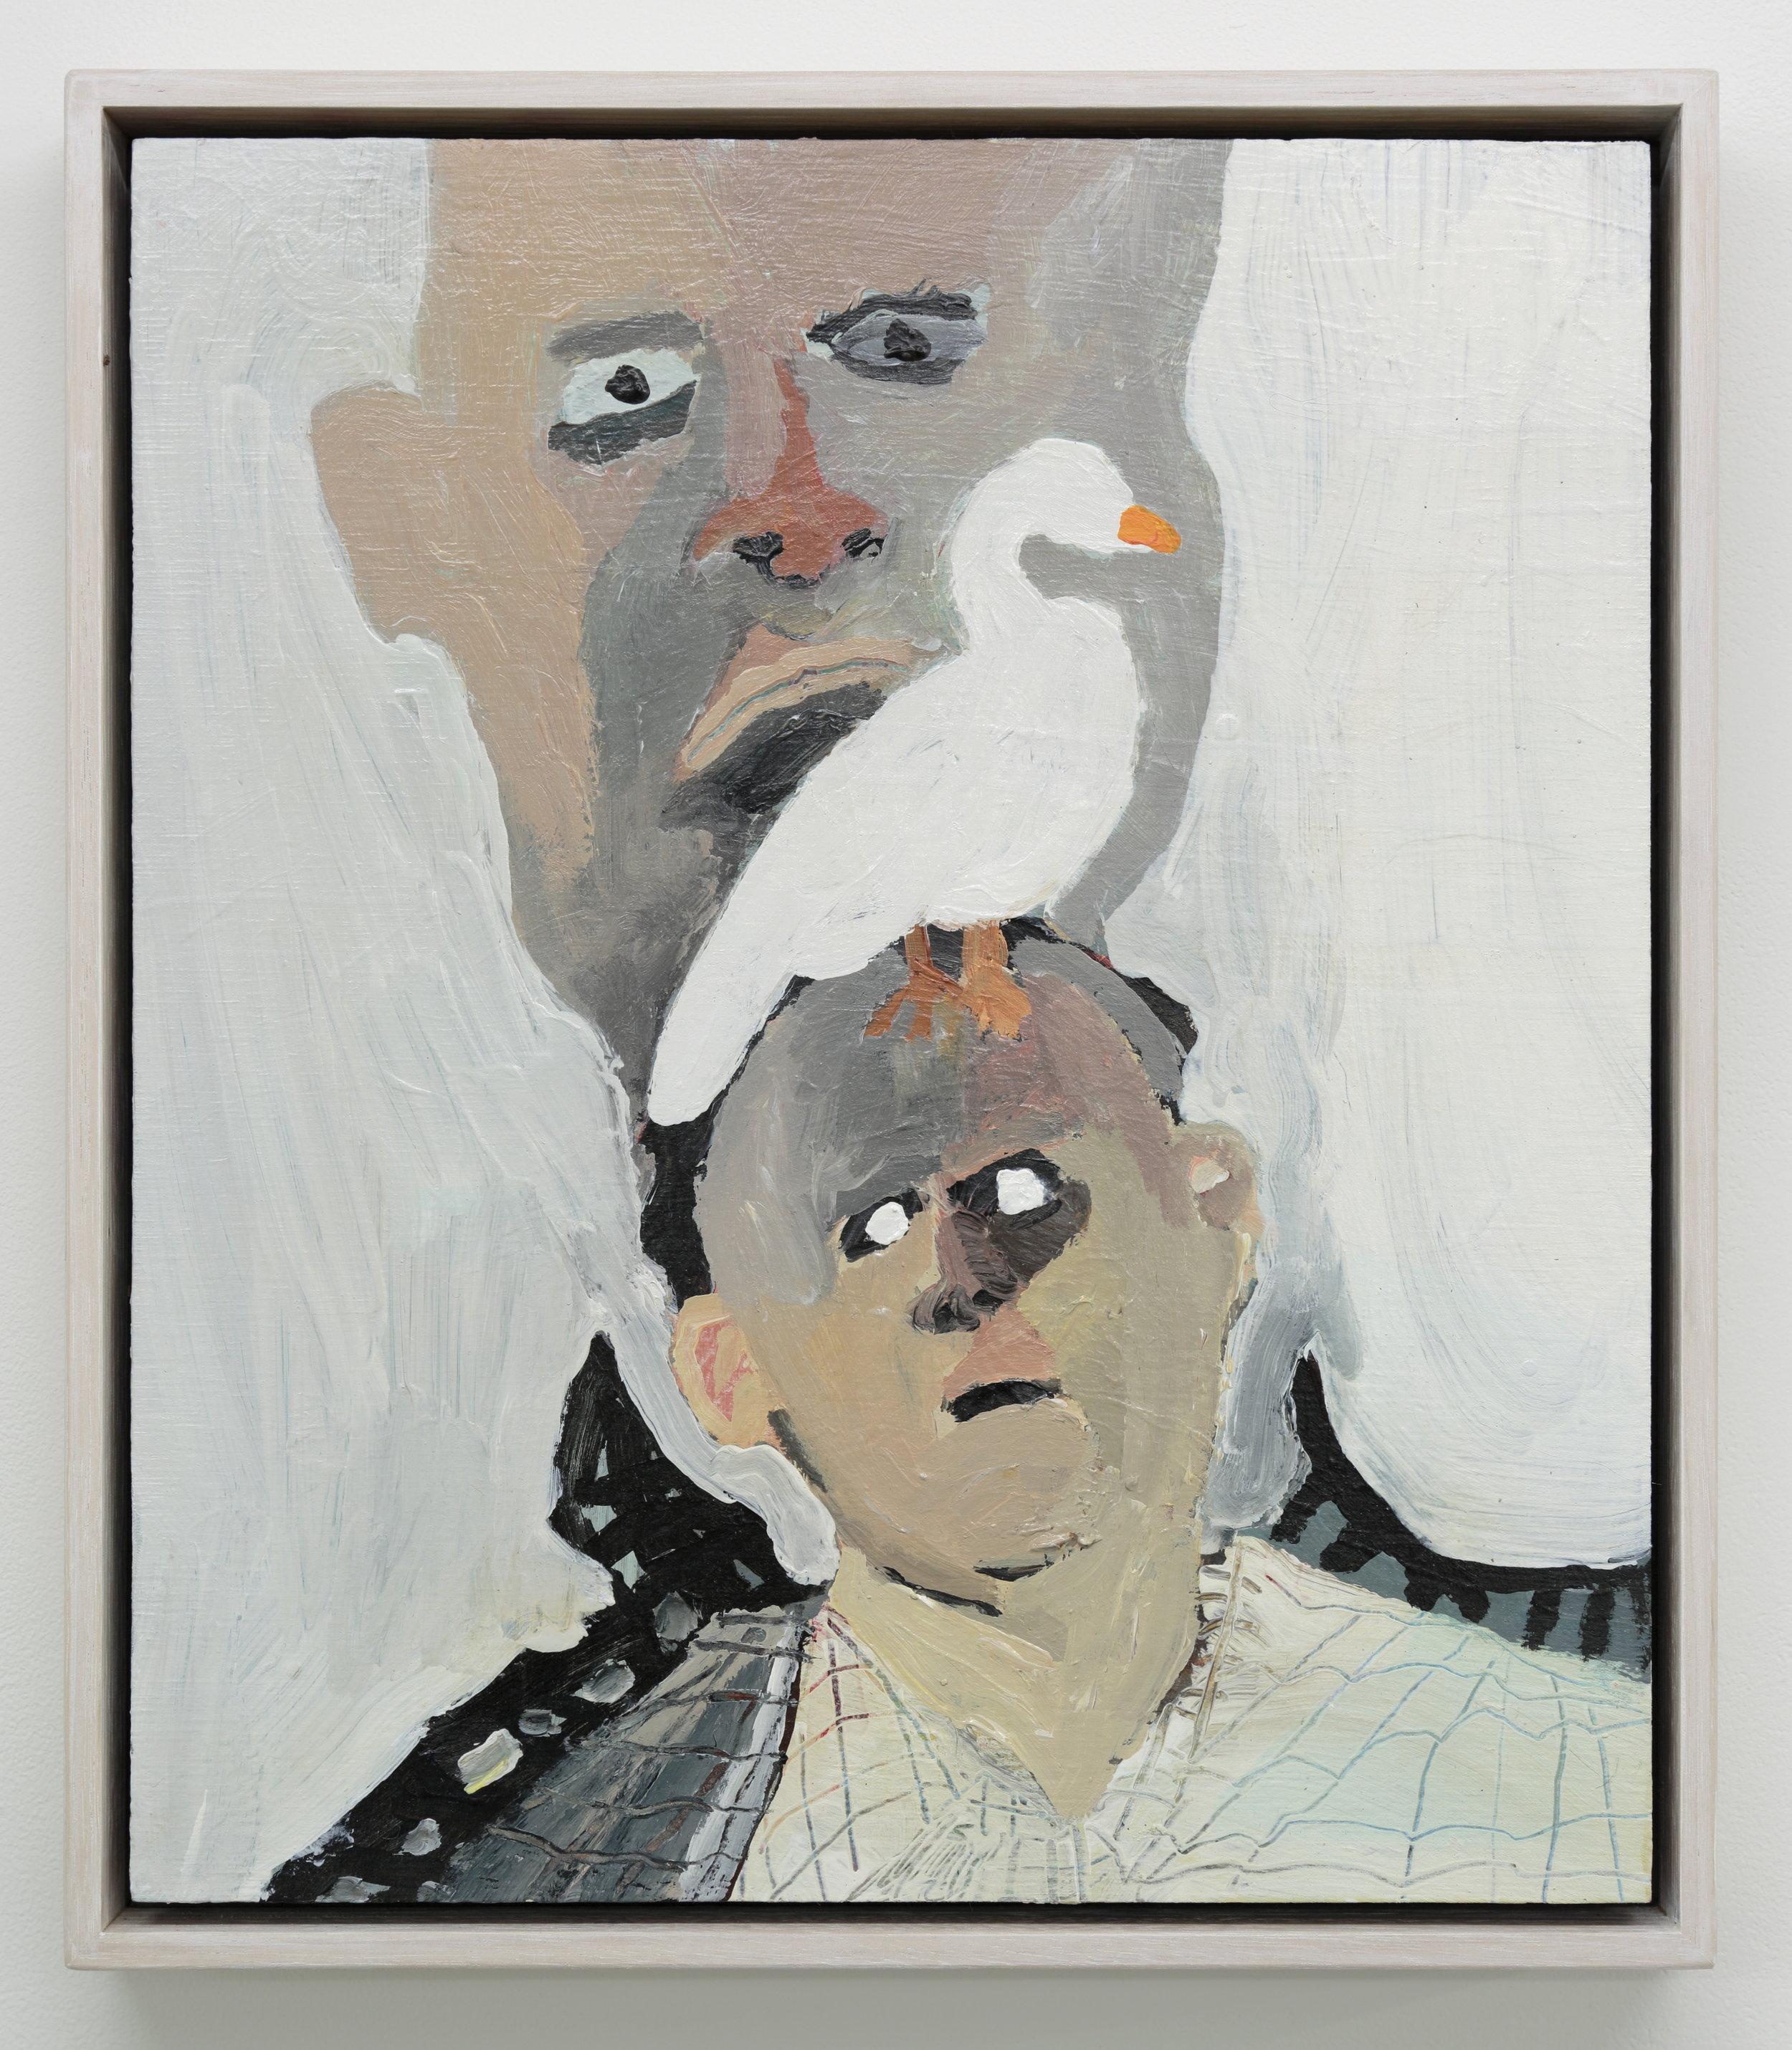 Conversation with bird 2017 Acrylic on board 30 x 25cm